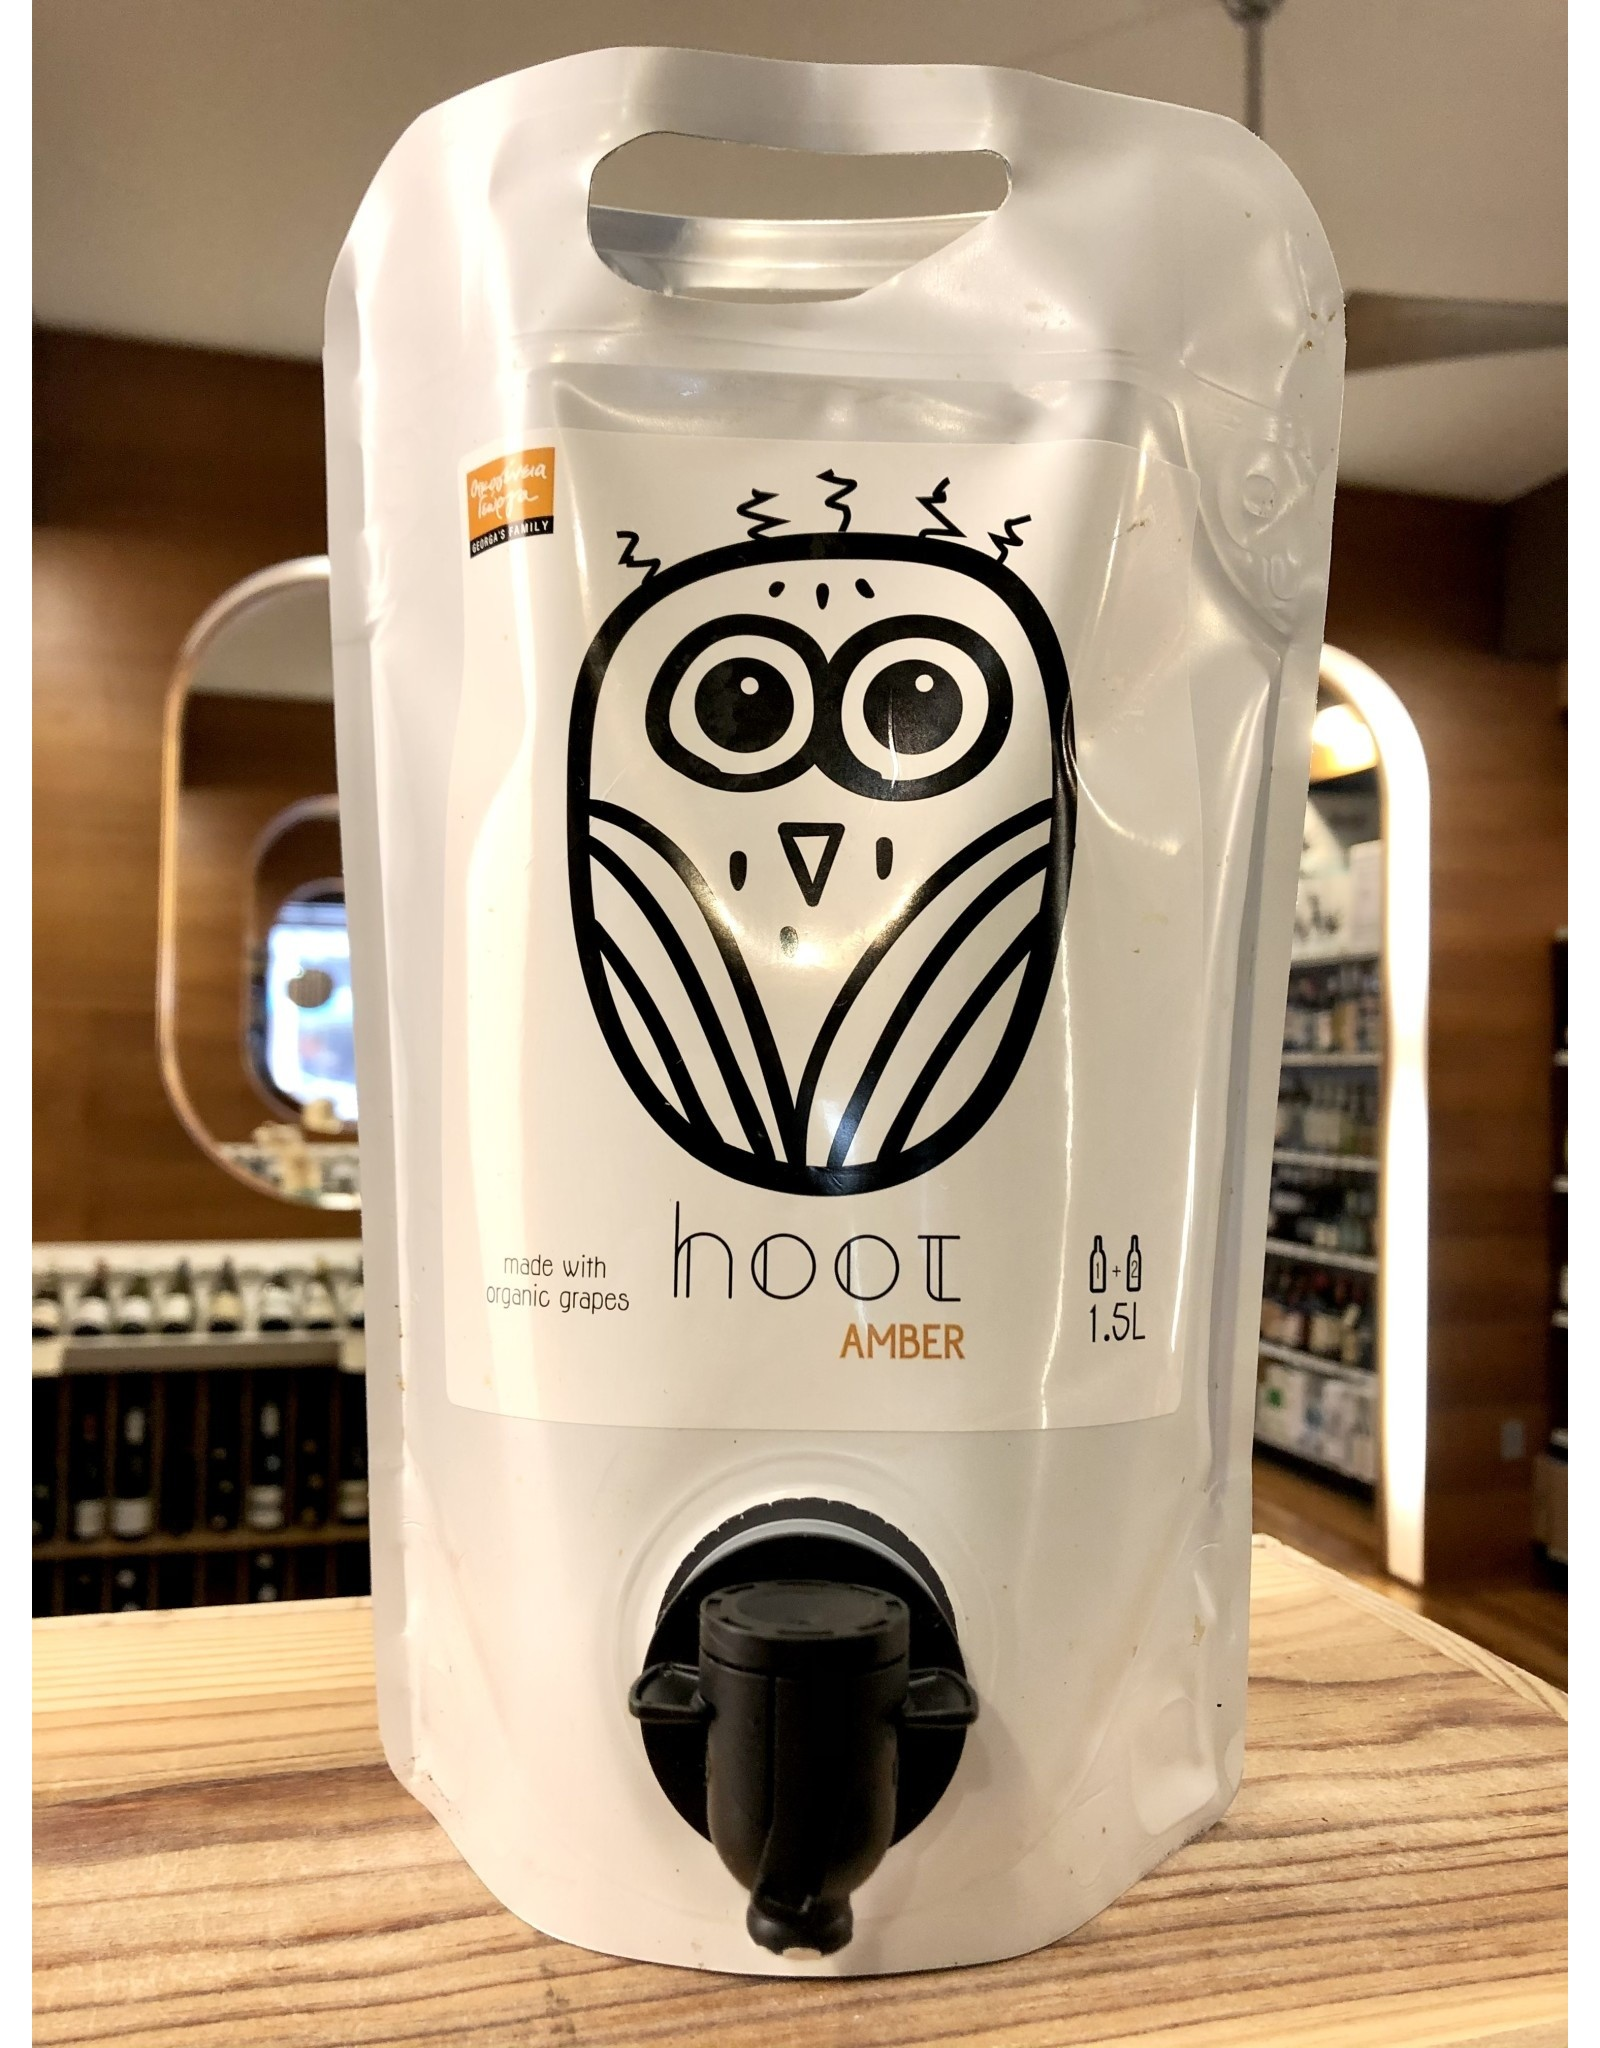 Georgas Hoot Amber - 1.5 Liter